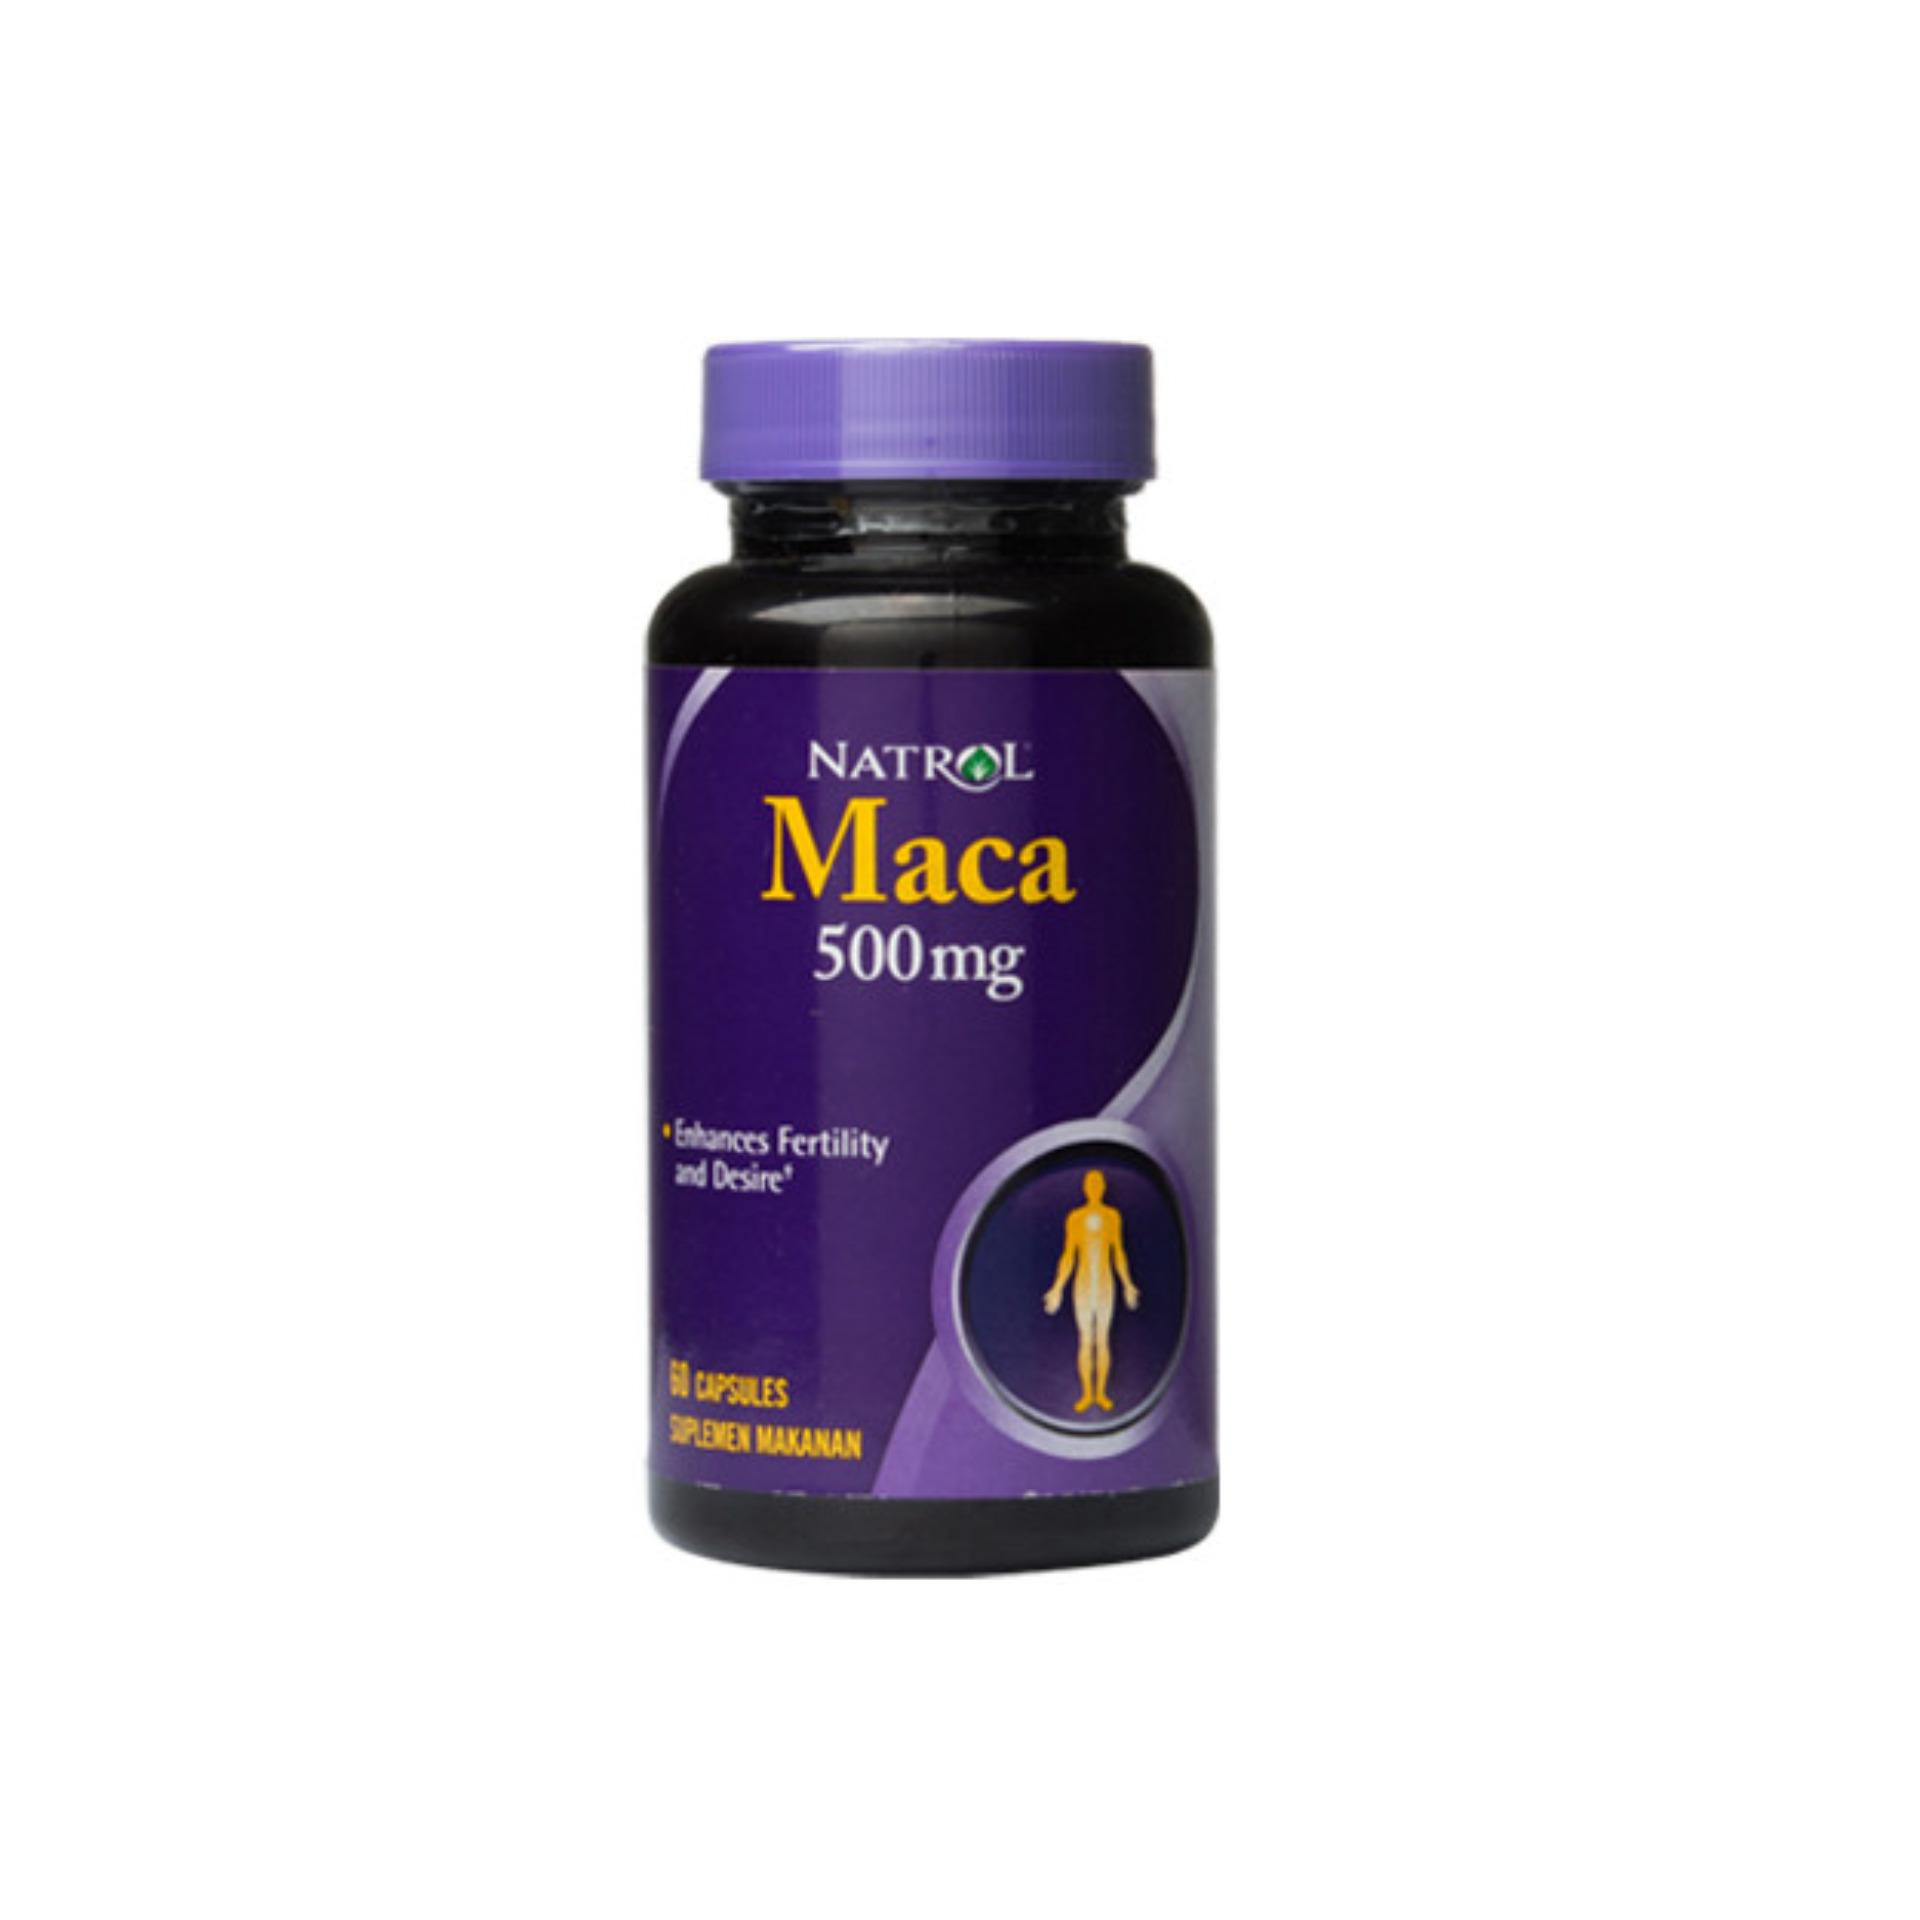 Jual Produk Kesehatan Seksual Super Tonik Madu Kuat Tahan Lama 6x Maca Extract 500 Mg 60s Meningkatkan Kesuburan Sistem Imunitas